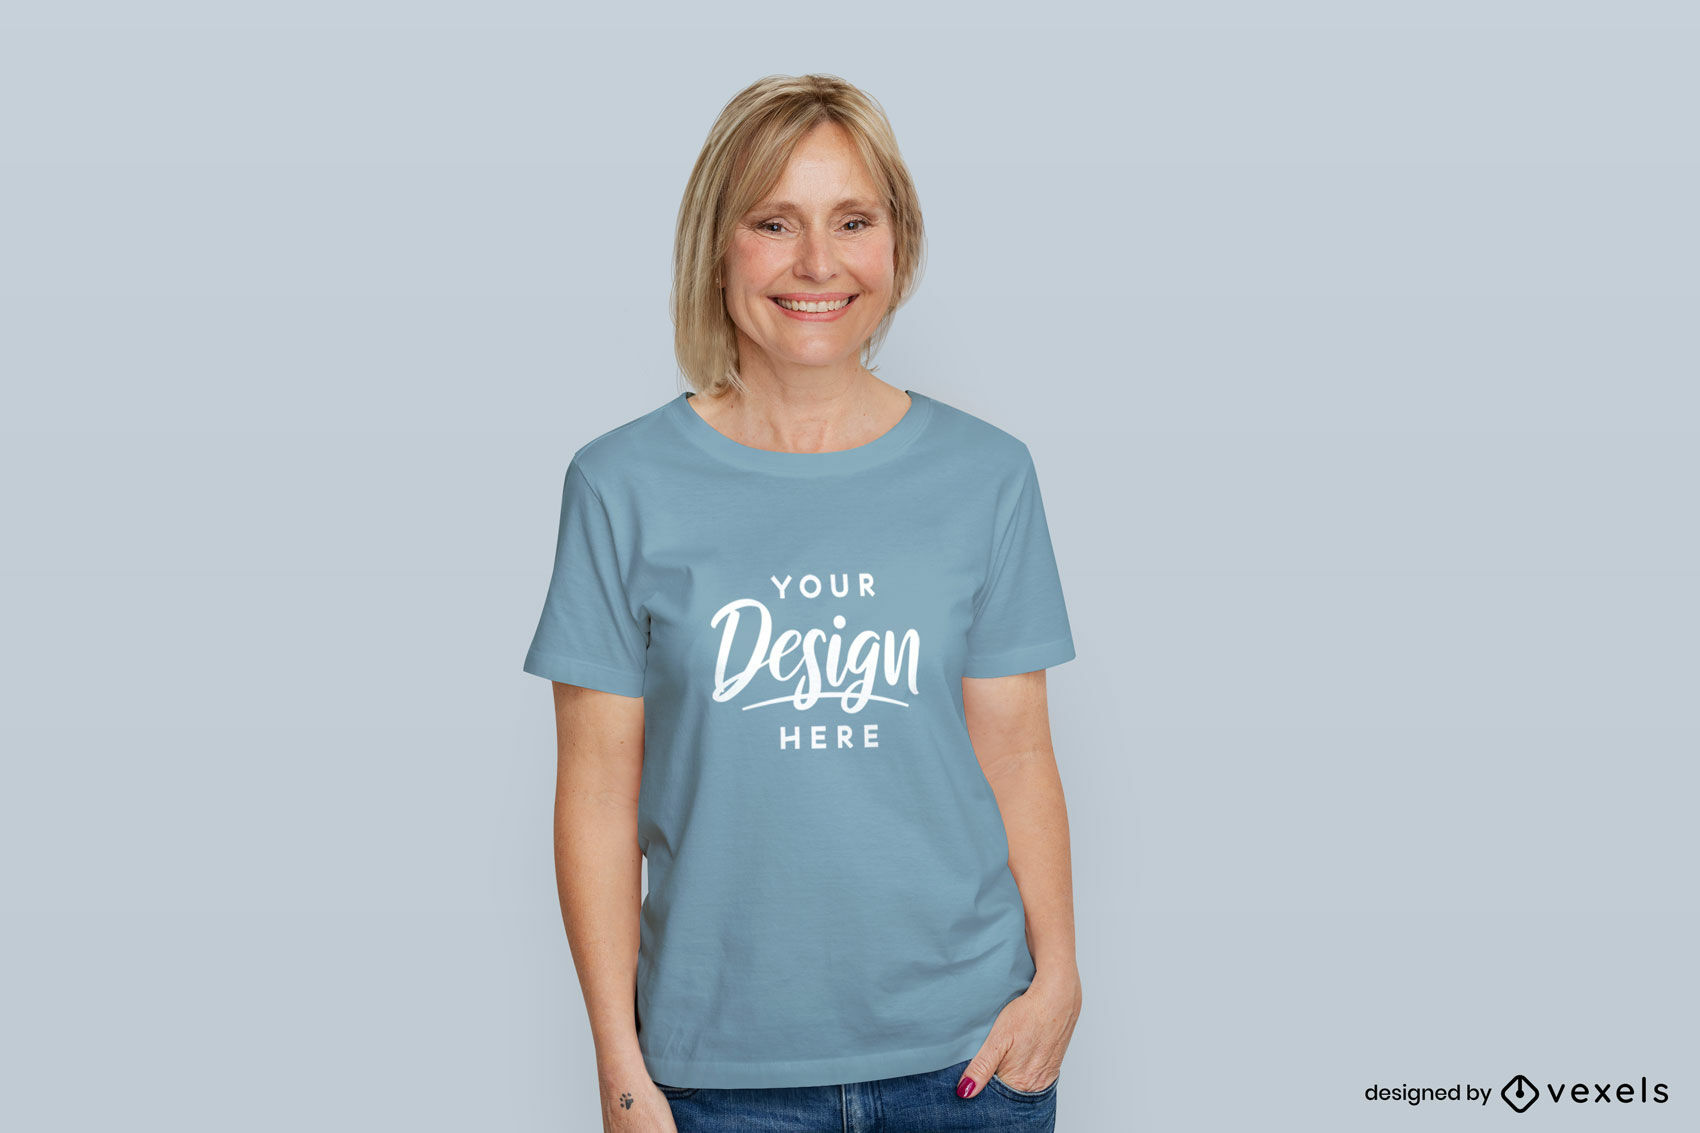 Fondo plano de maqueta de camiseta azul claro de mujer